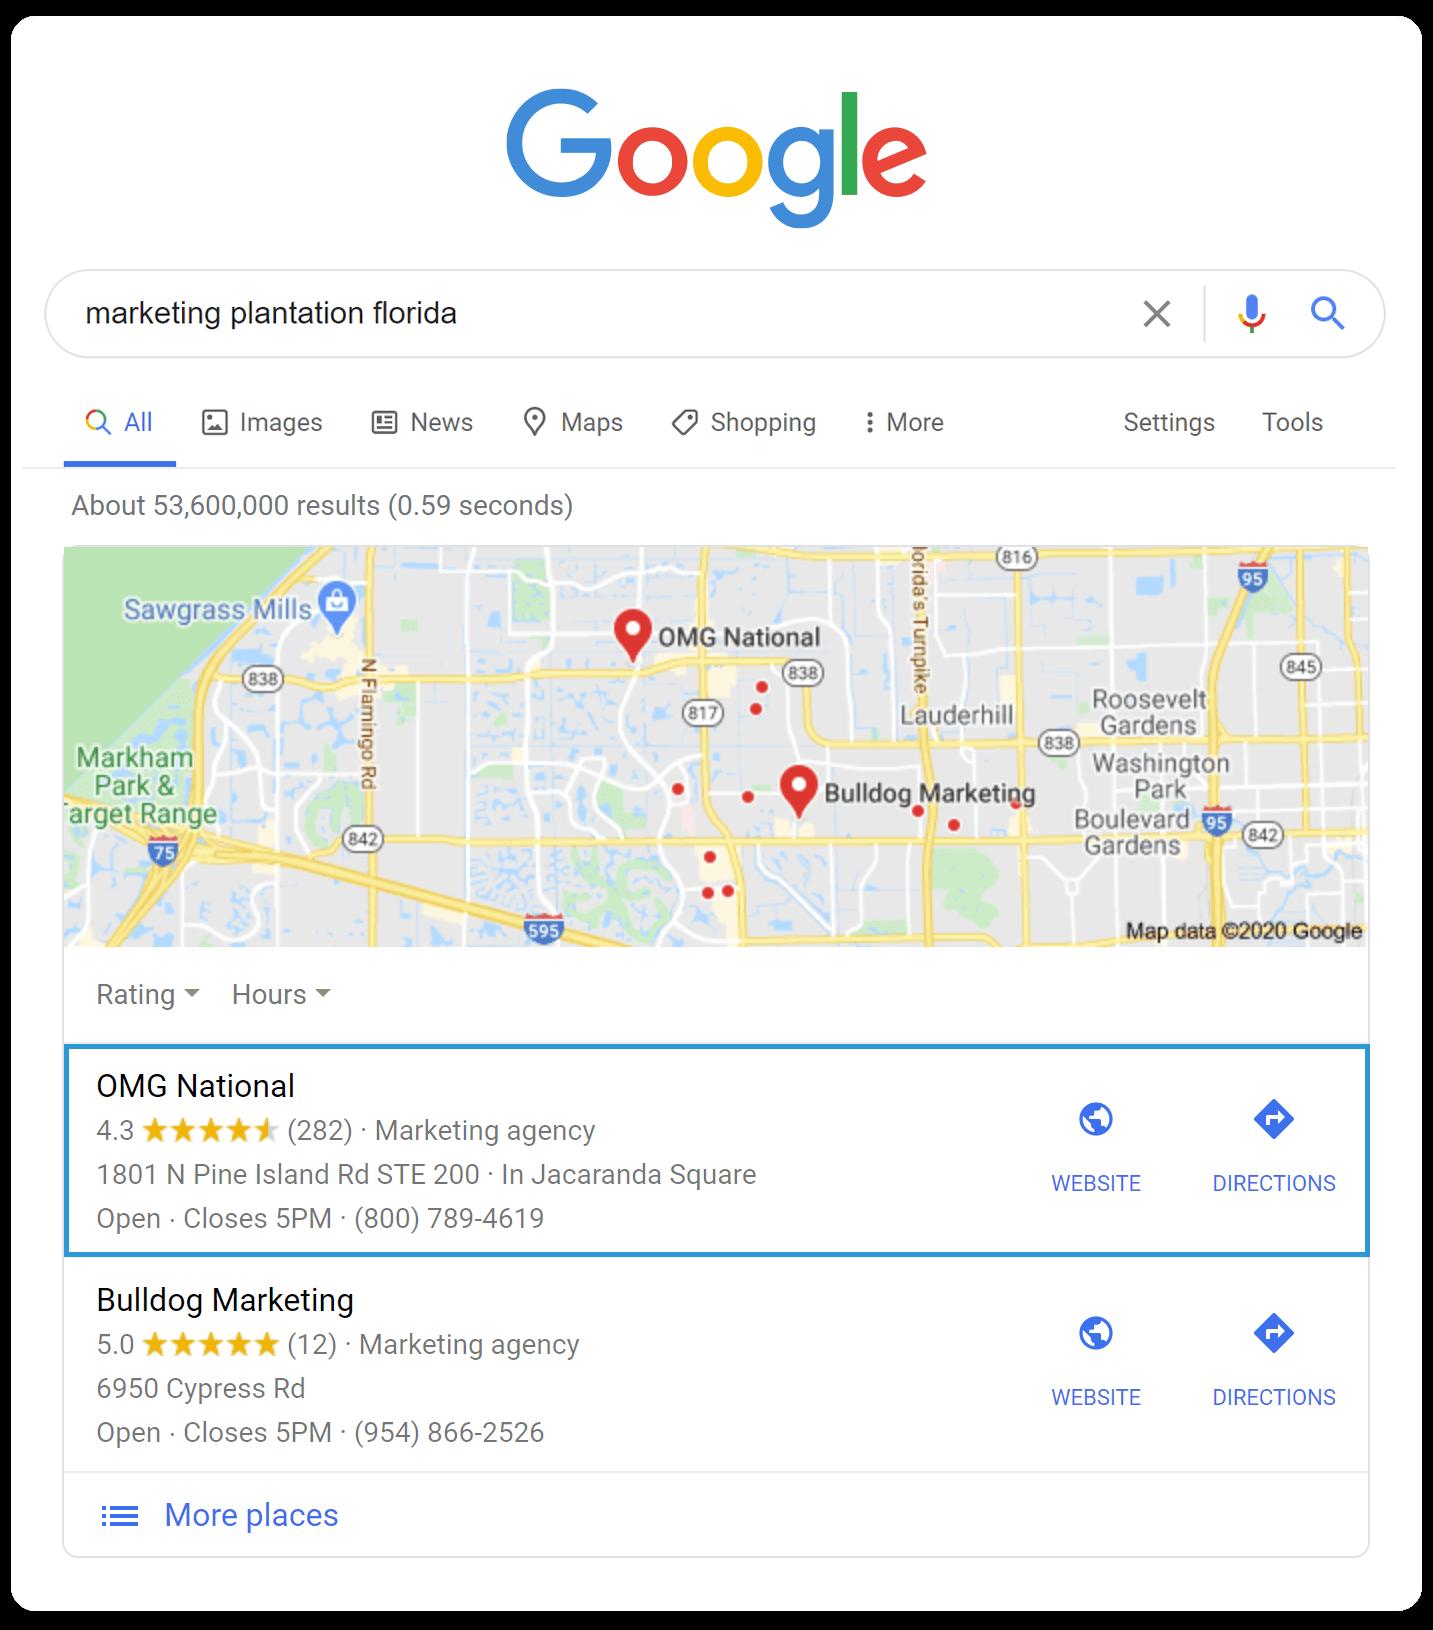 Googlelocalpackv6